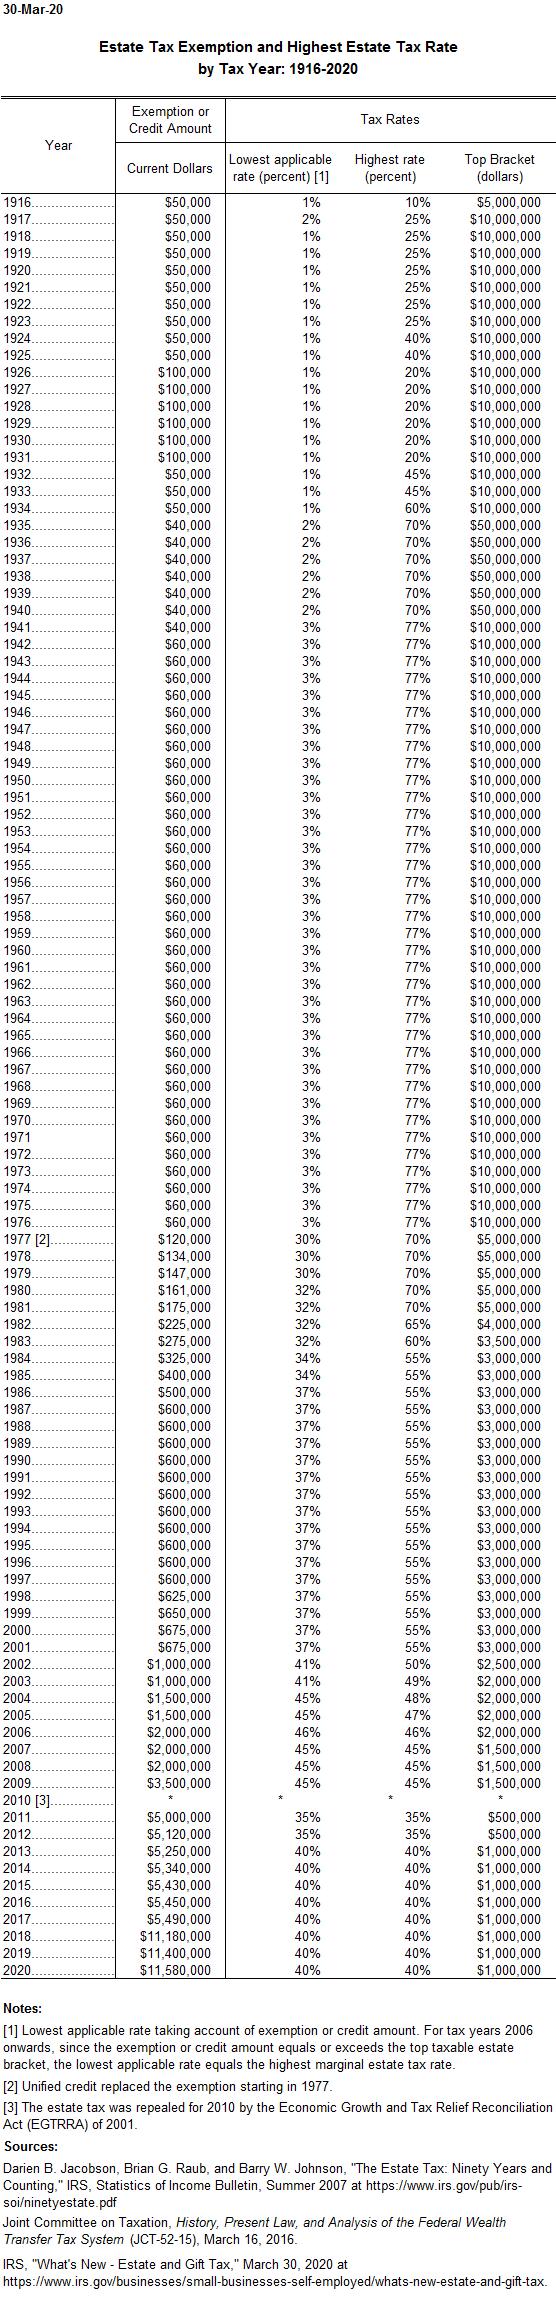 Estate Tax Exemption Level